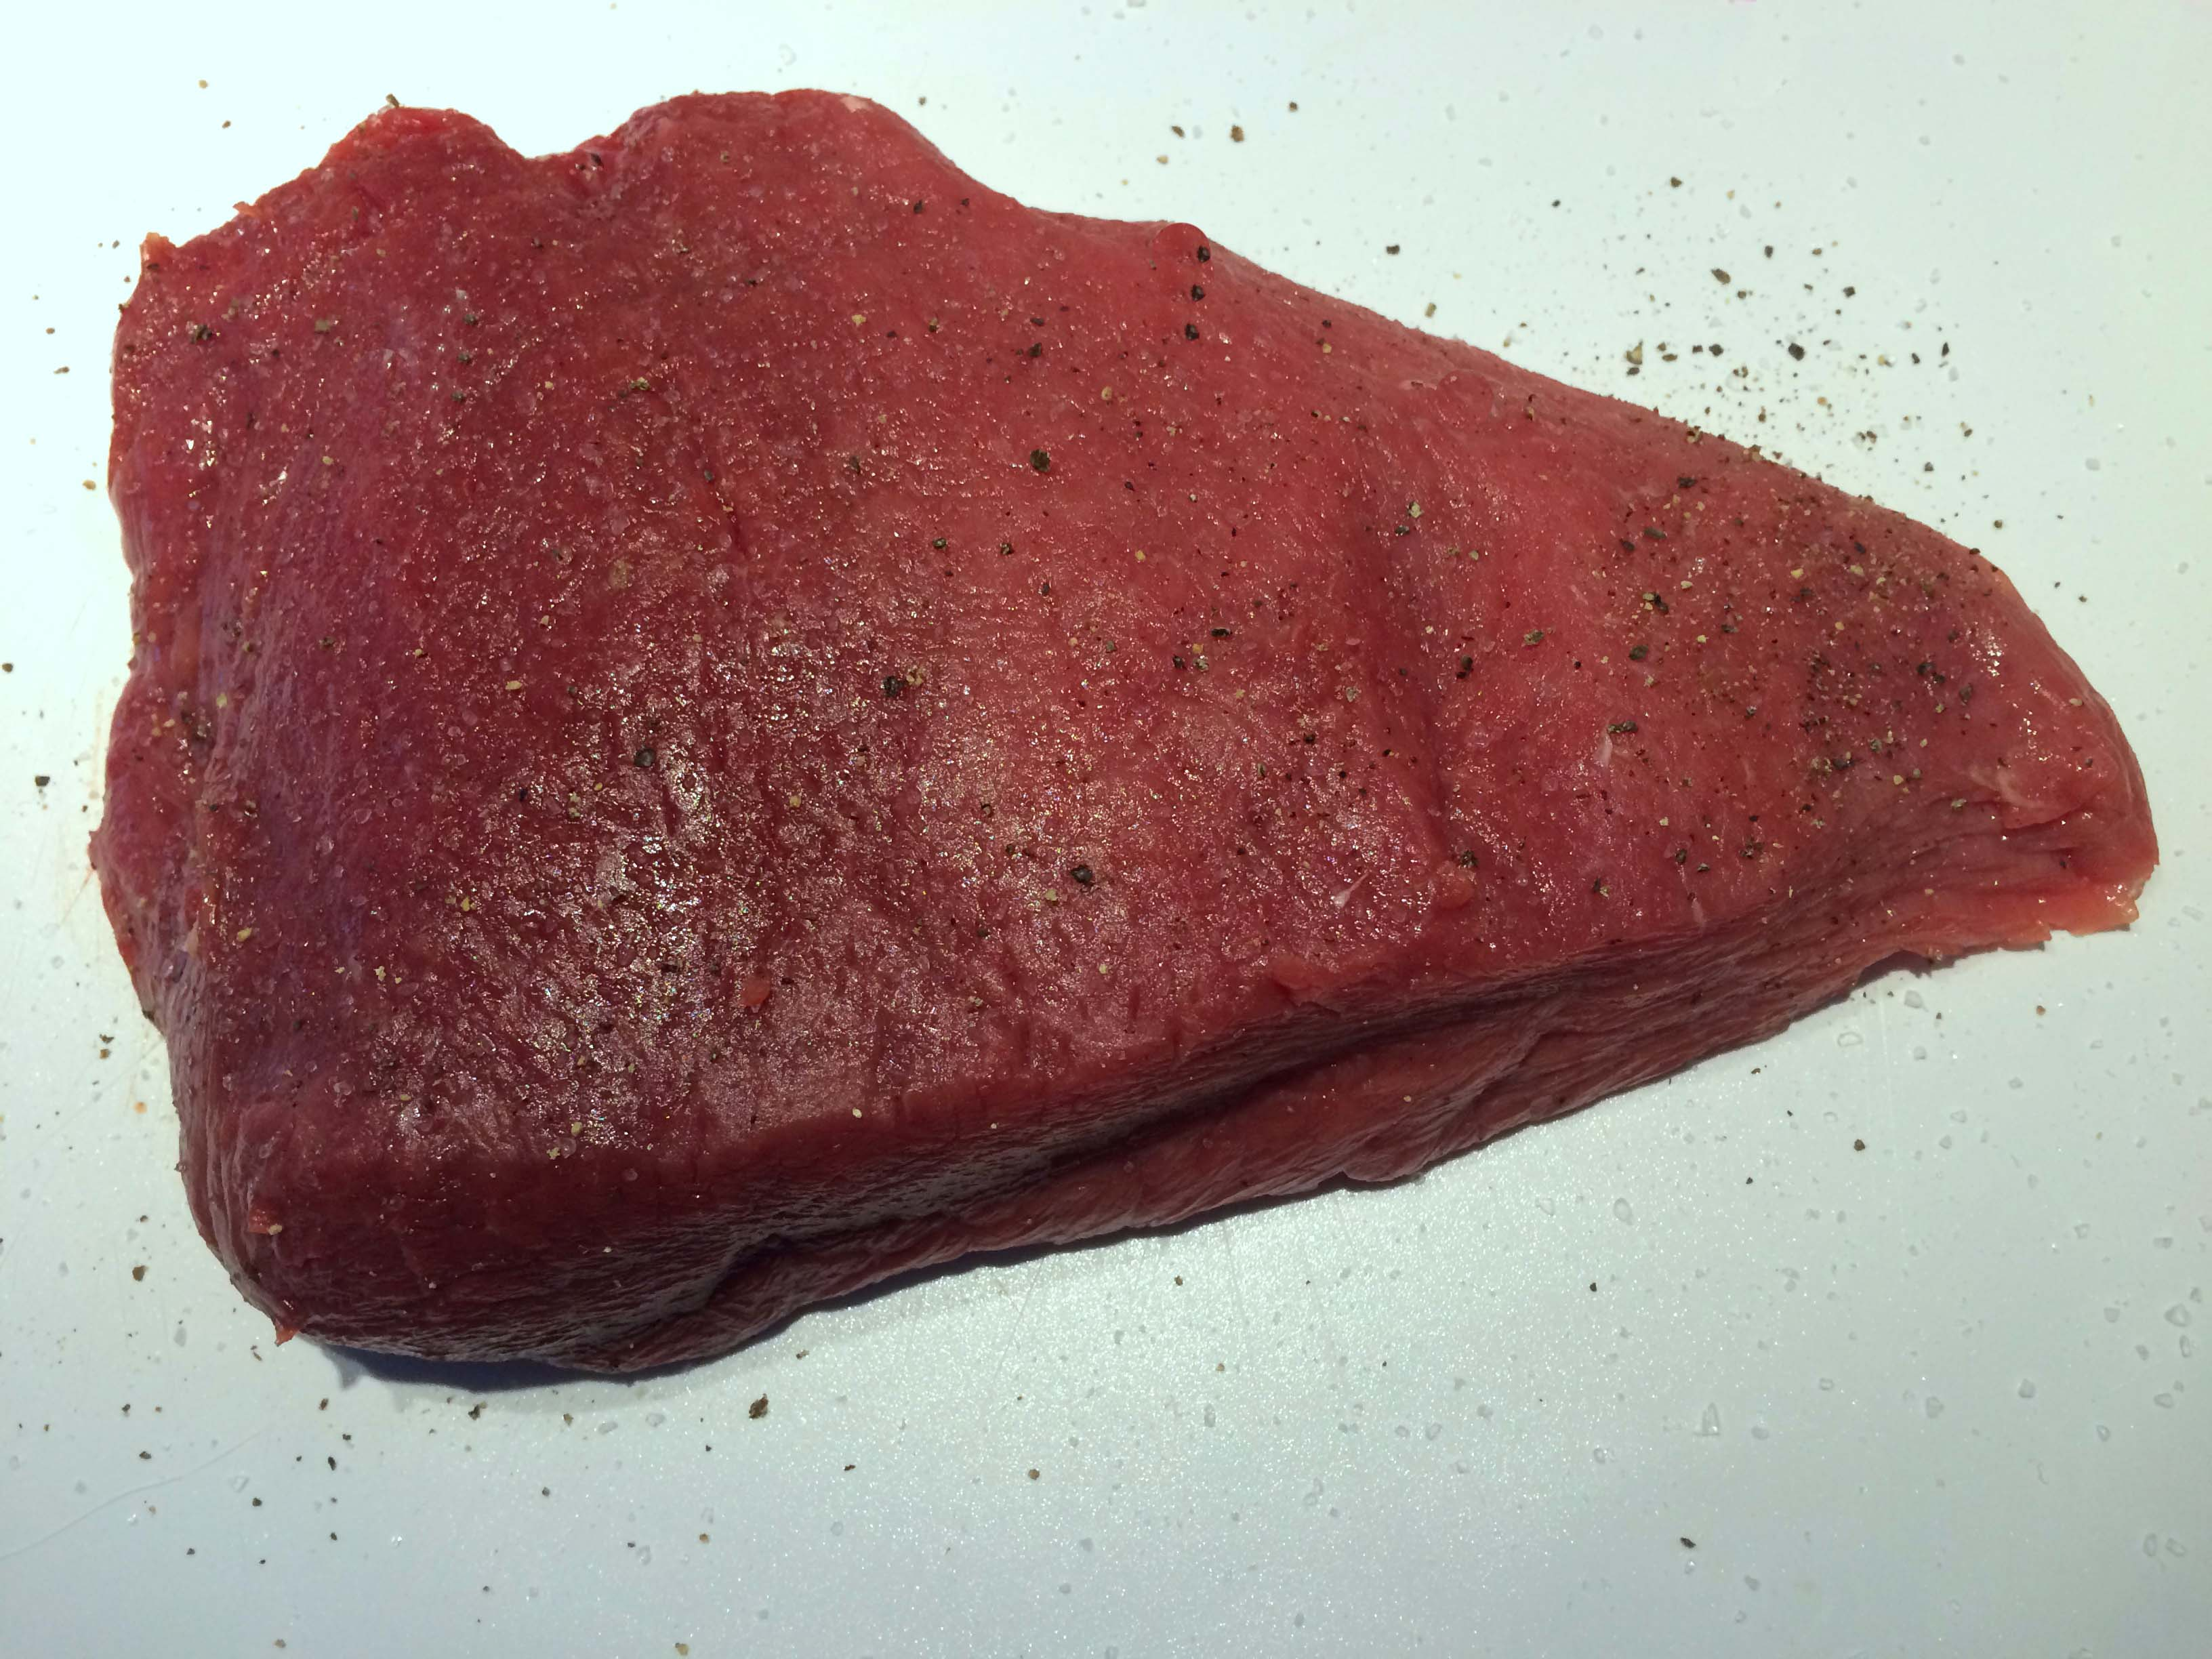 biefstuk met peper